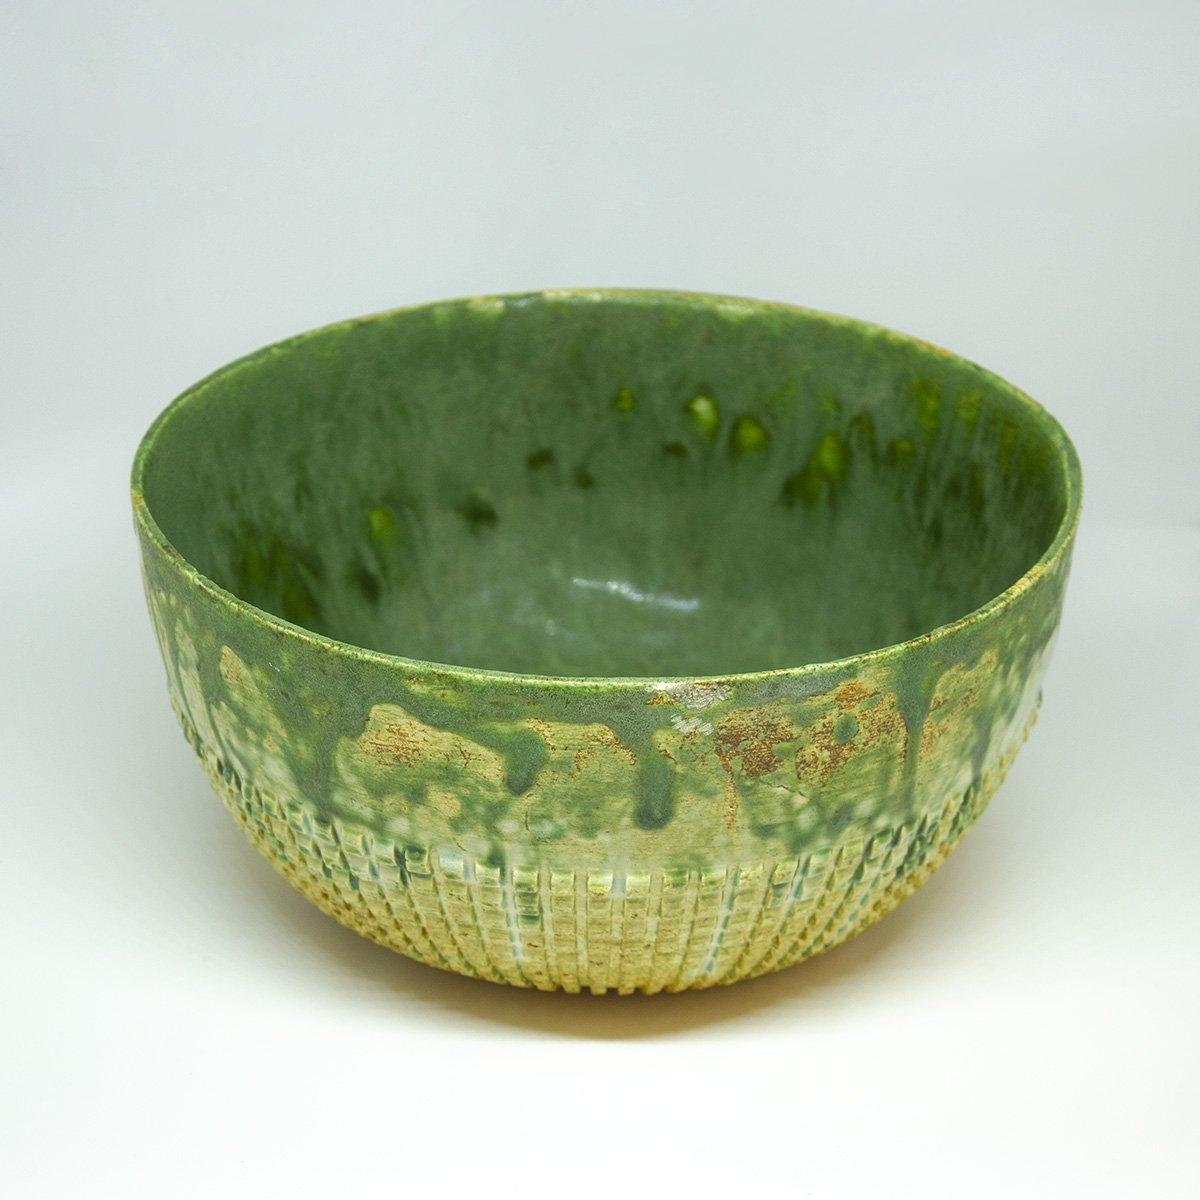 Dast large bowl green and transparent | Dast grote kom en transparant - een stip